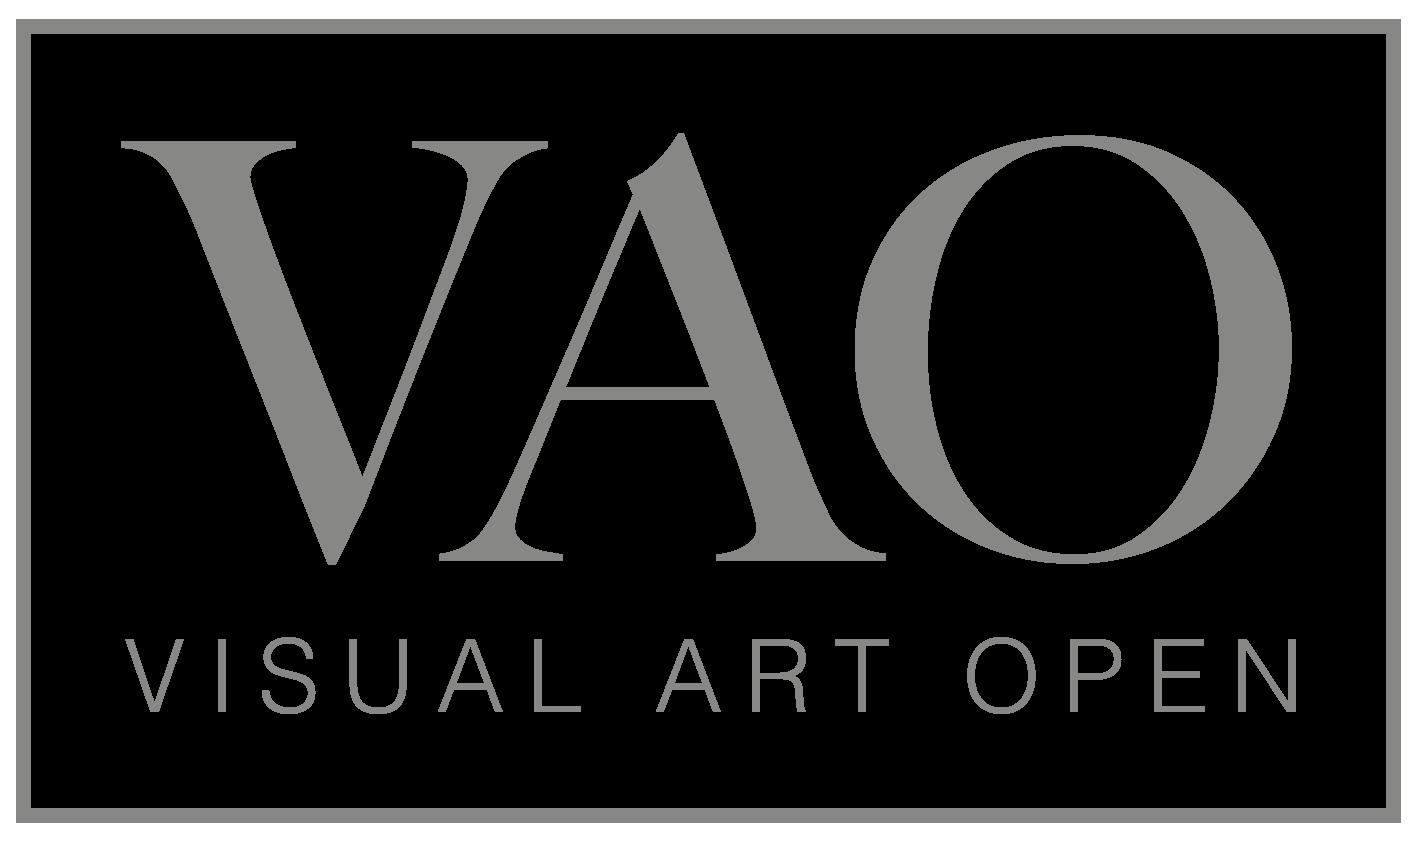 Visual Art Open 2019